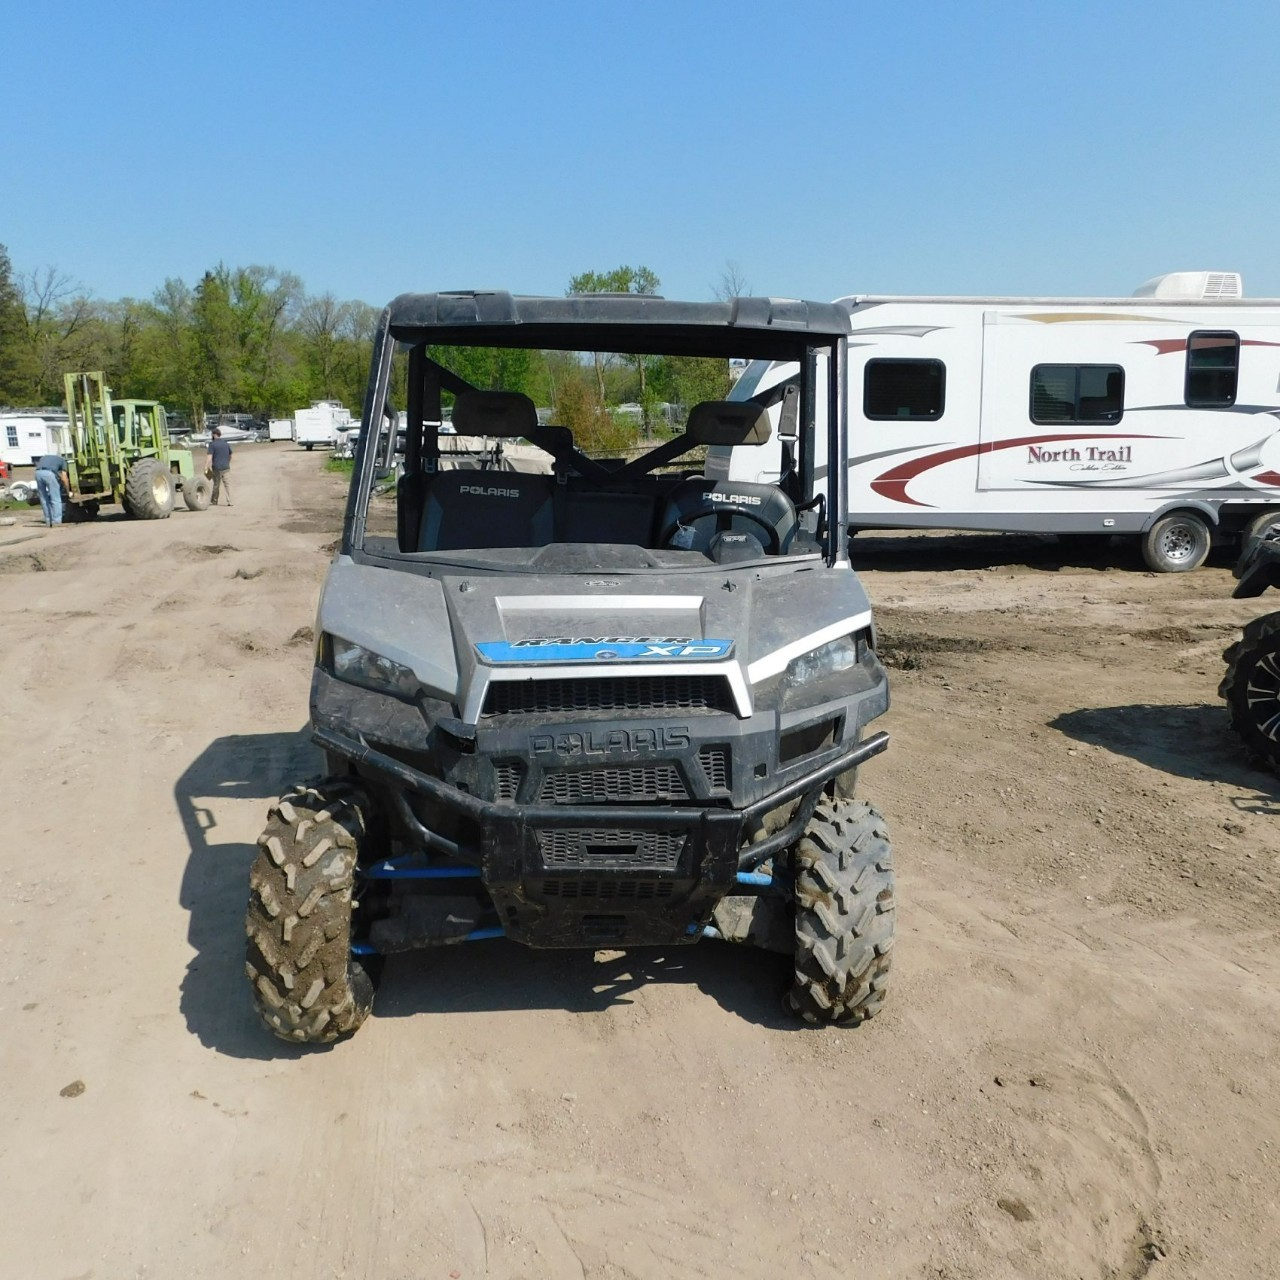 Used Ranger Xp 900 For Sale - Polaris ATVs - Snowmobile Trader